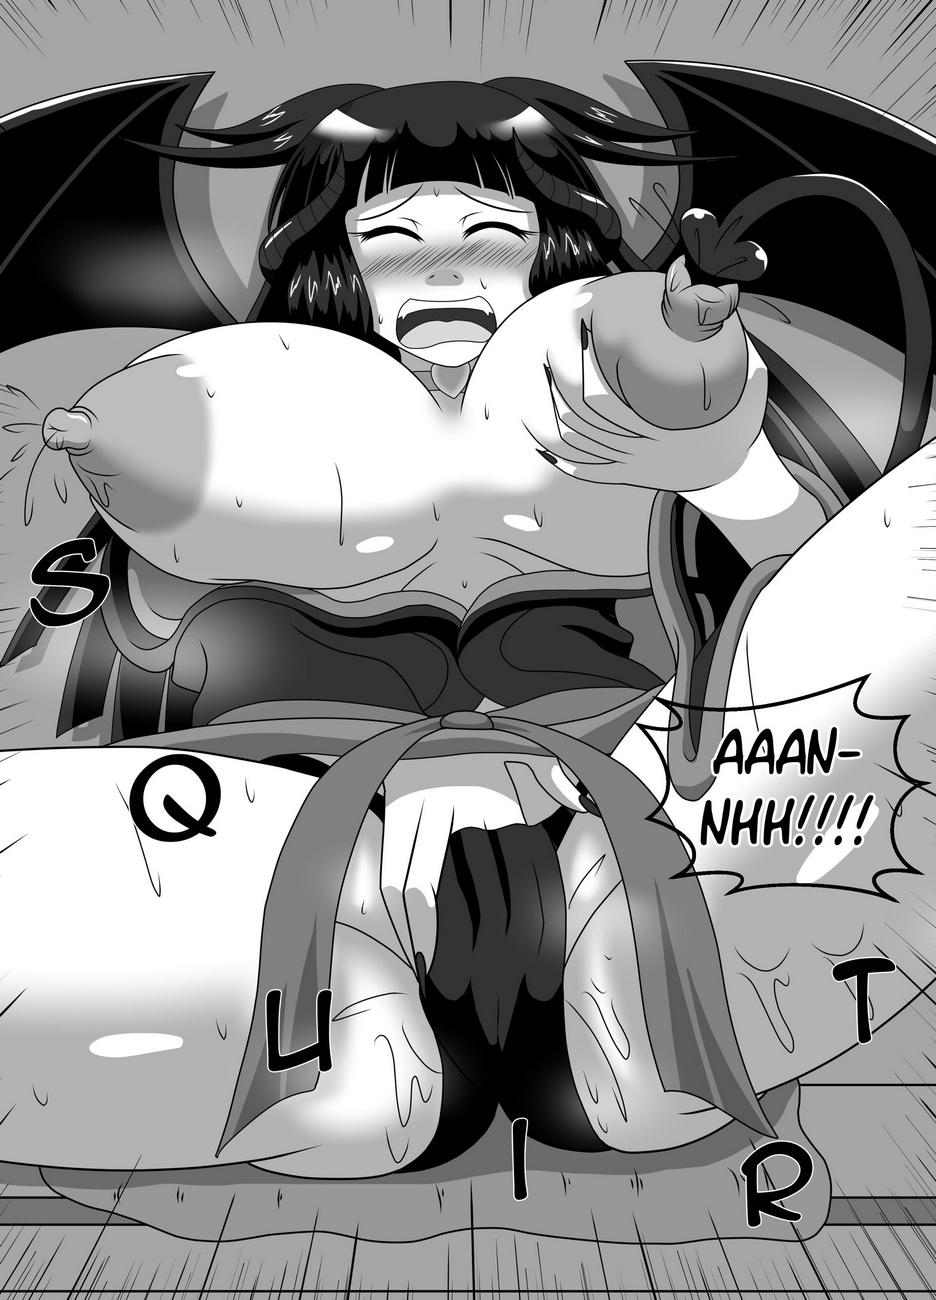 Miko X Monster 1 - part 2